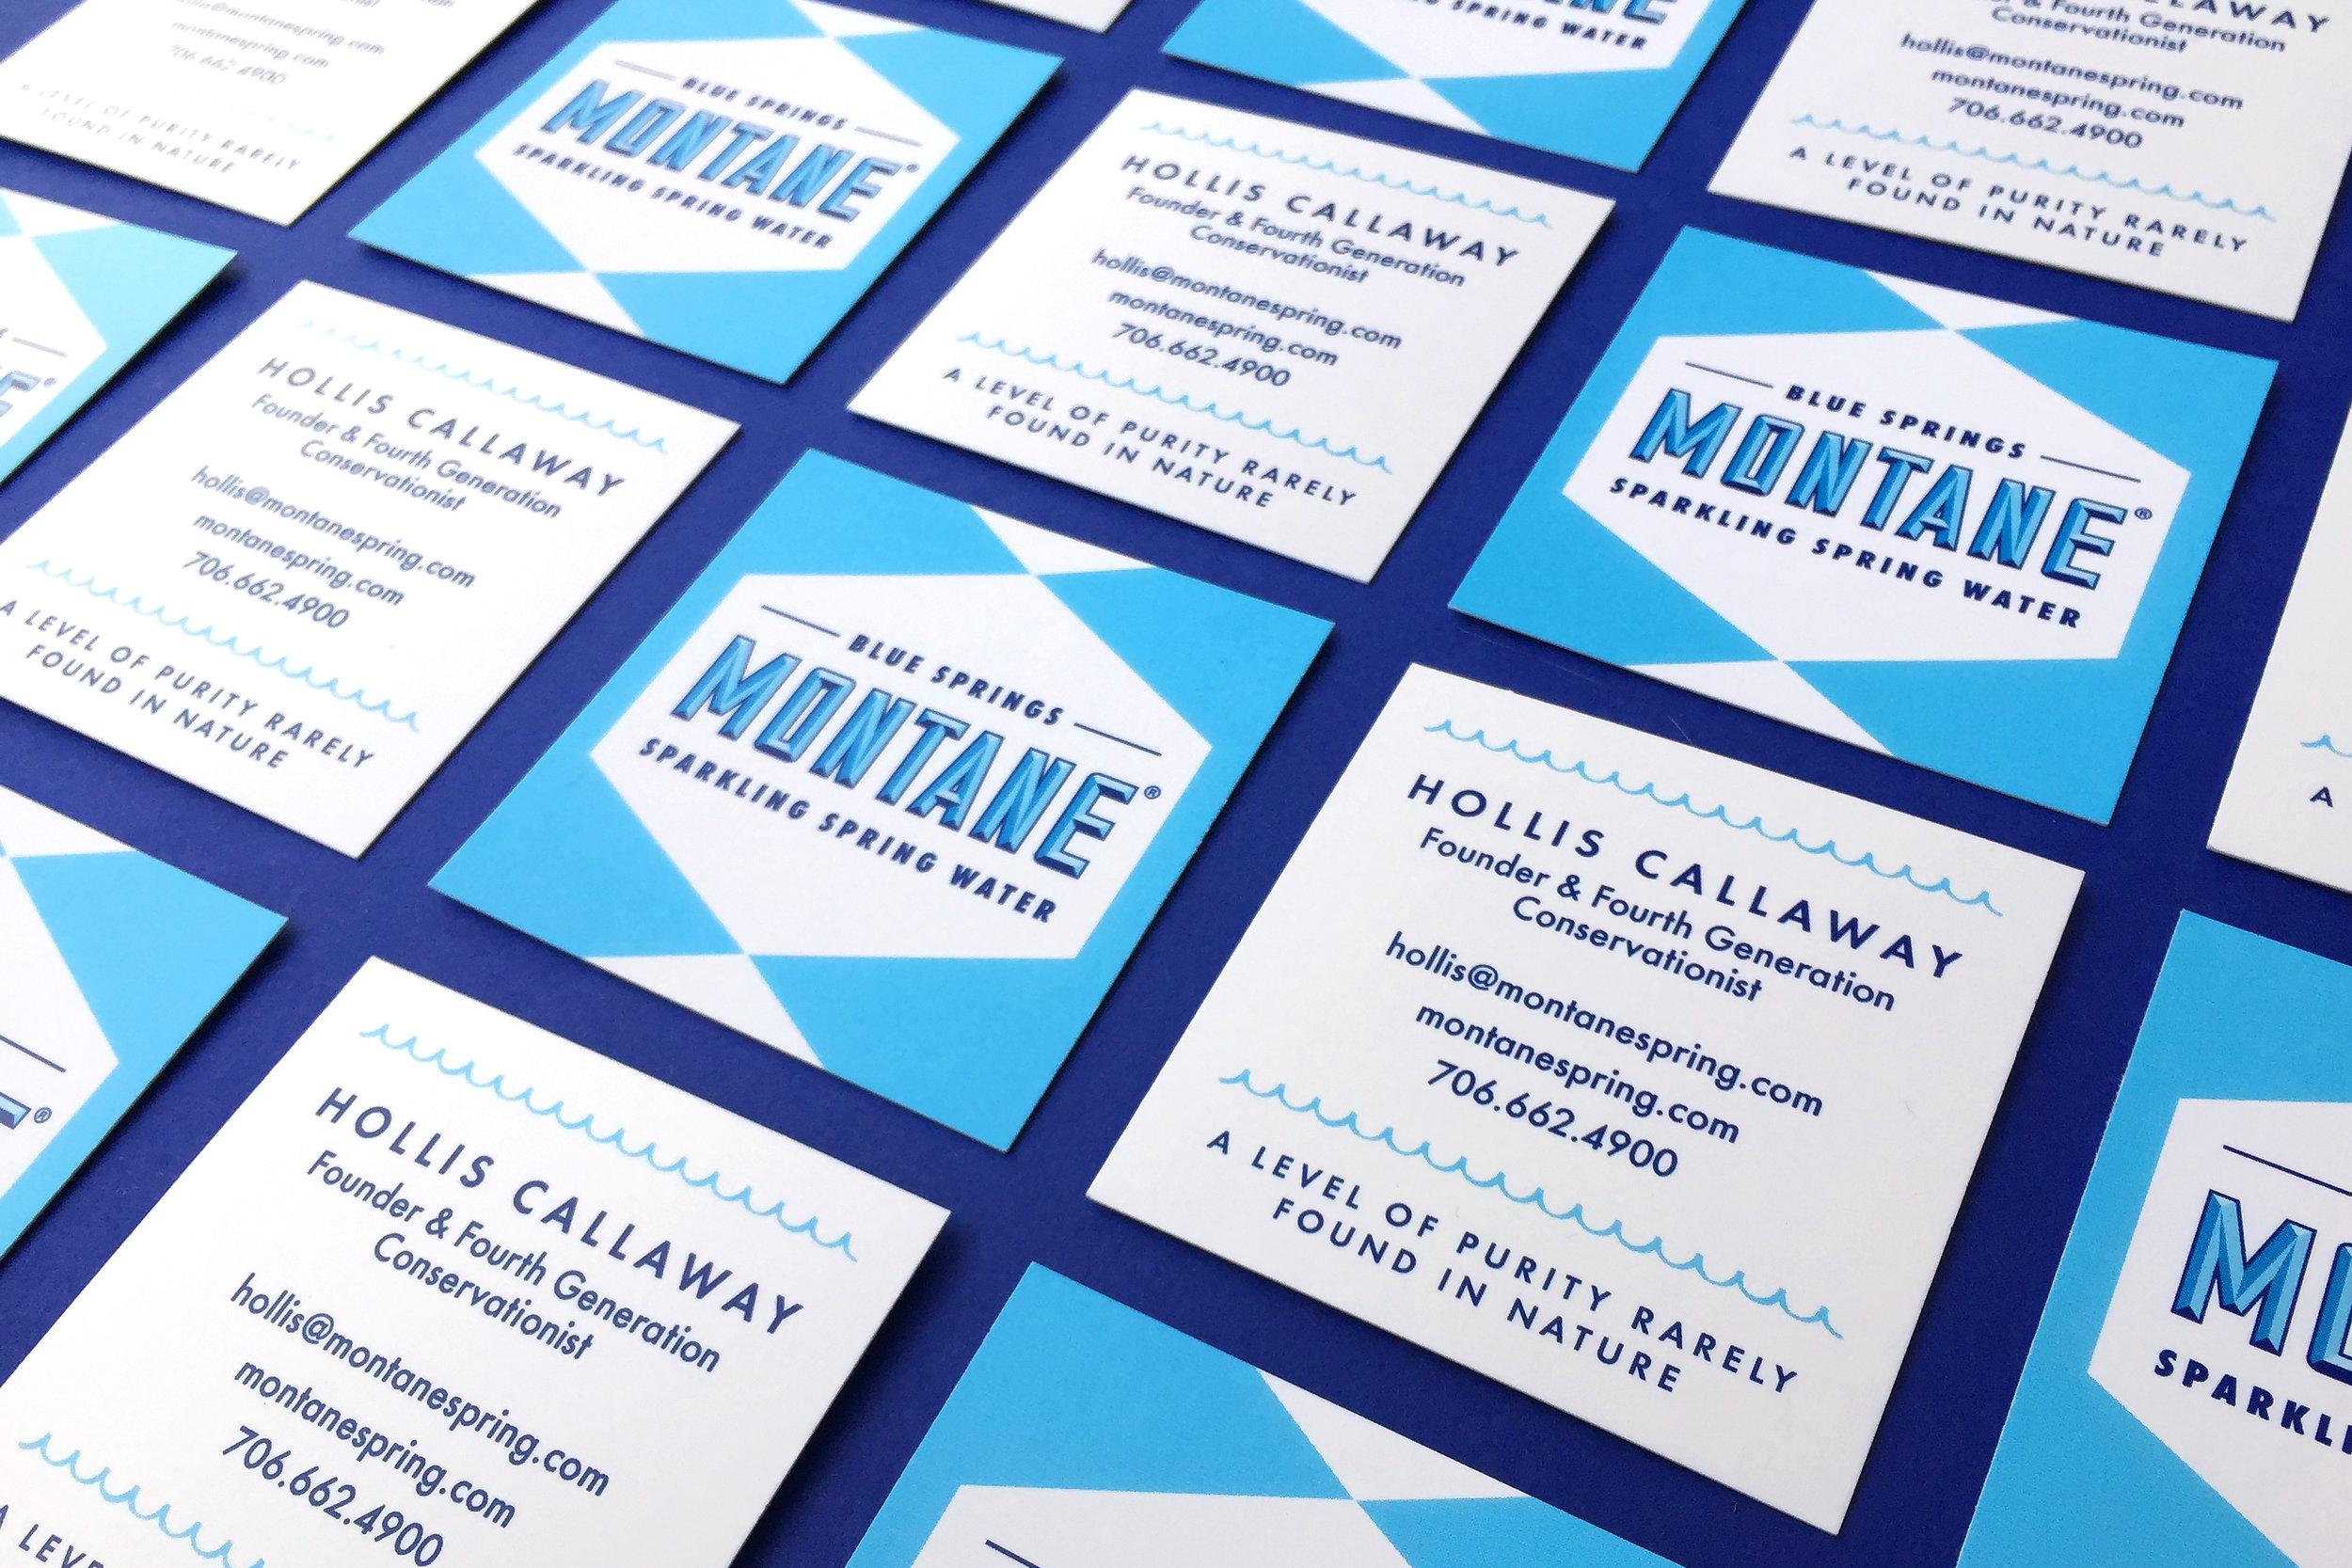 KCD-Montane-bizcards.jpg